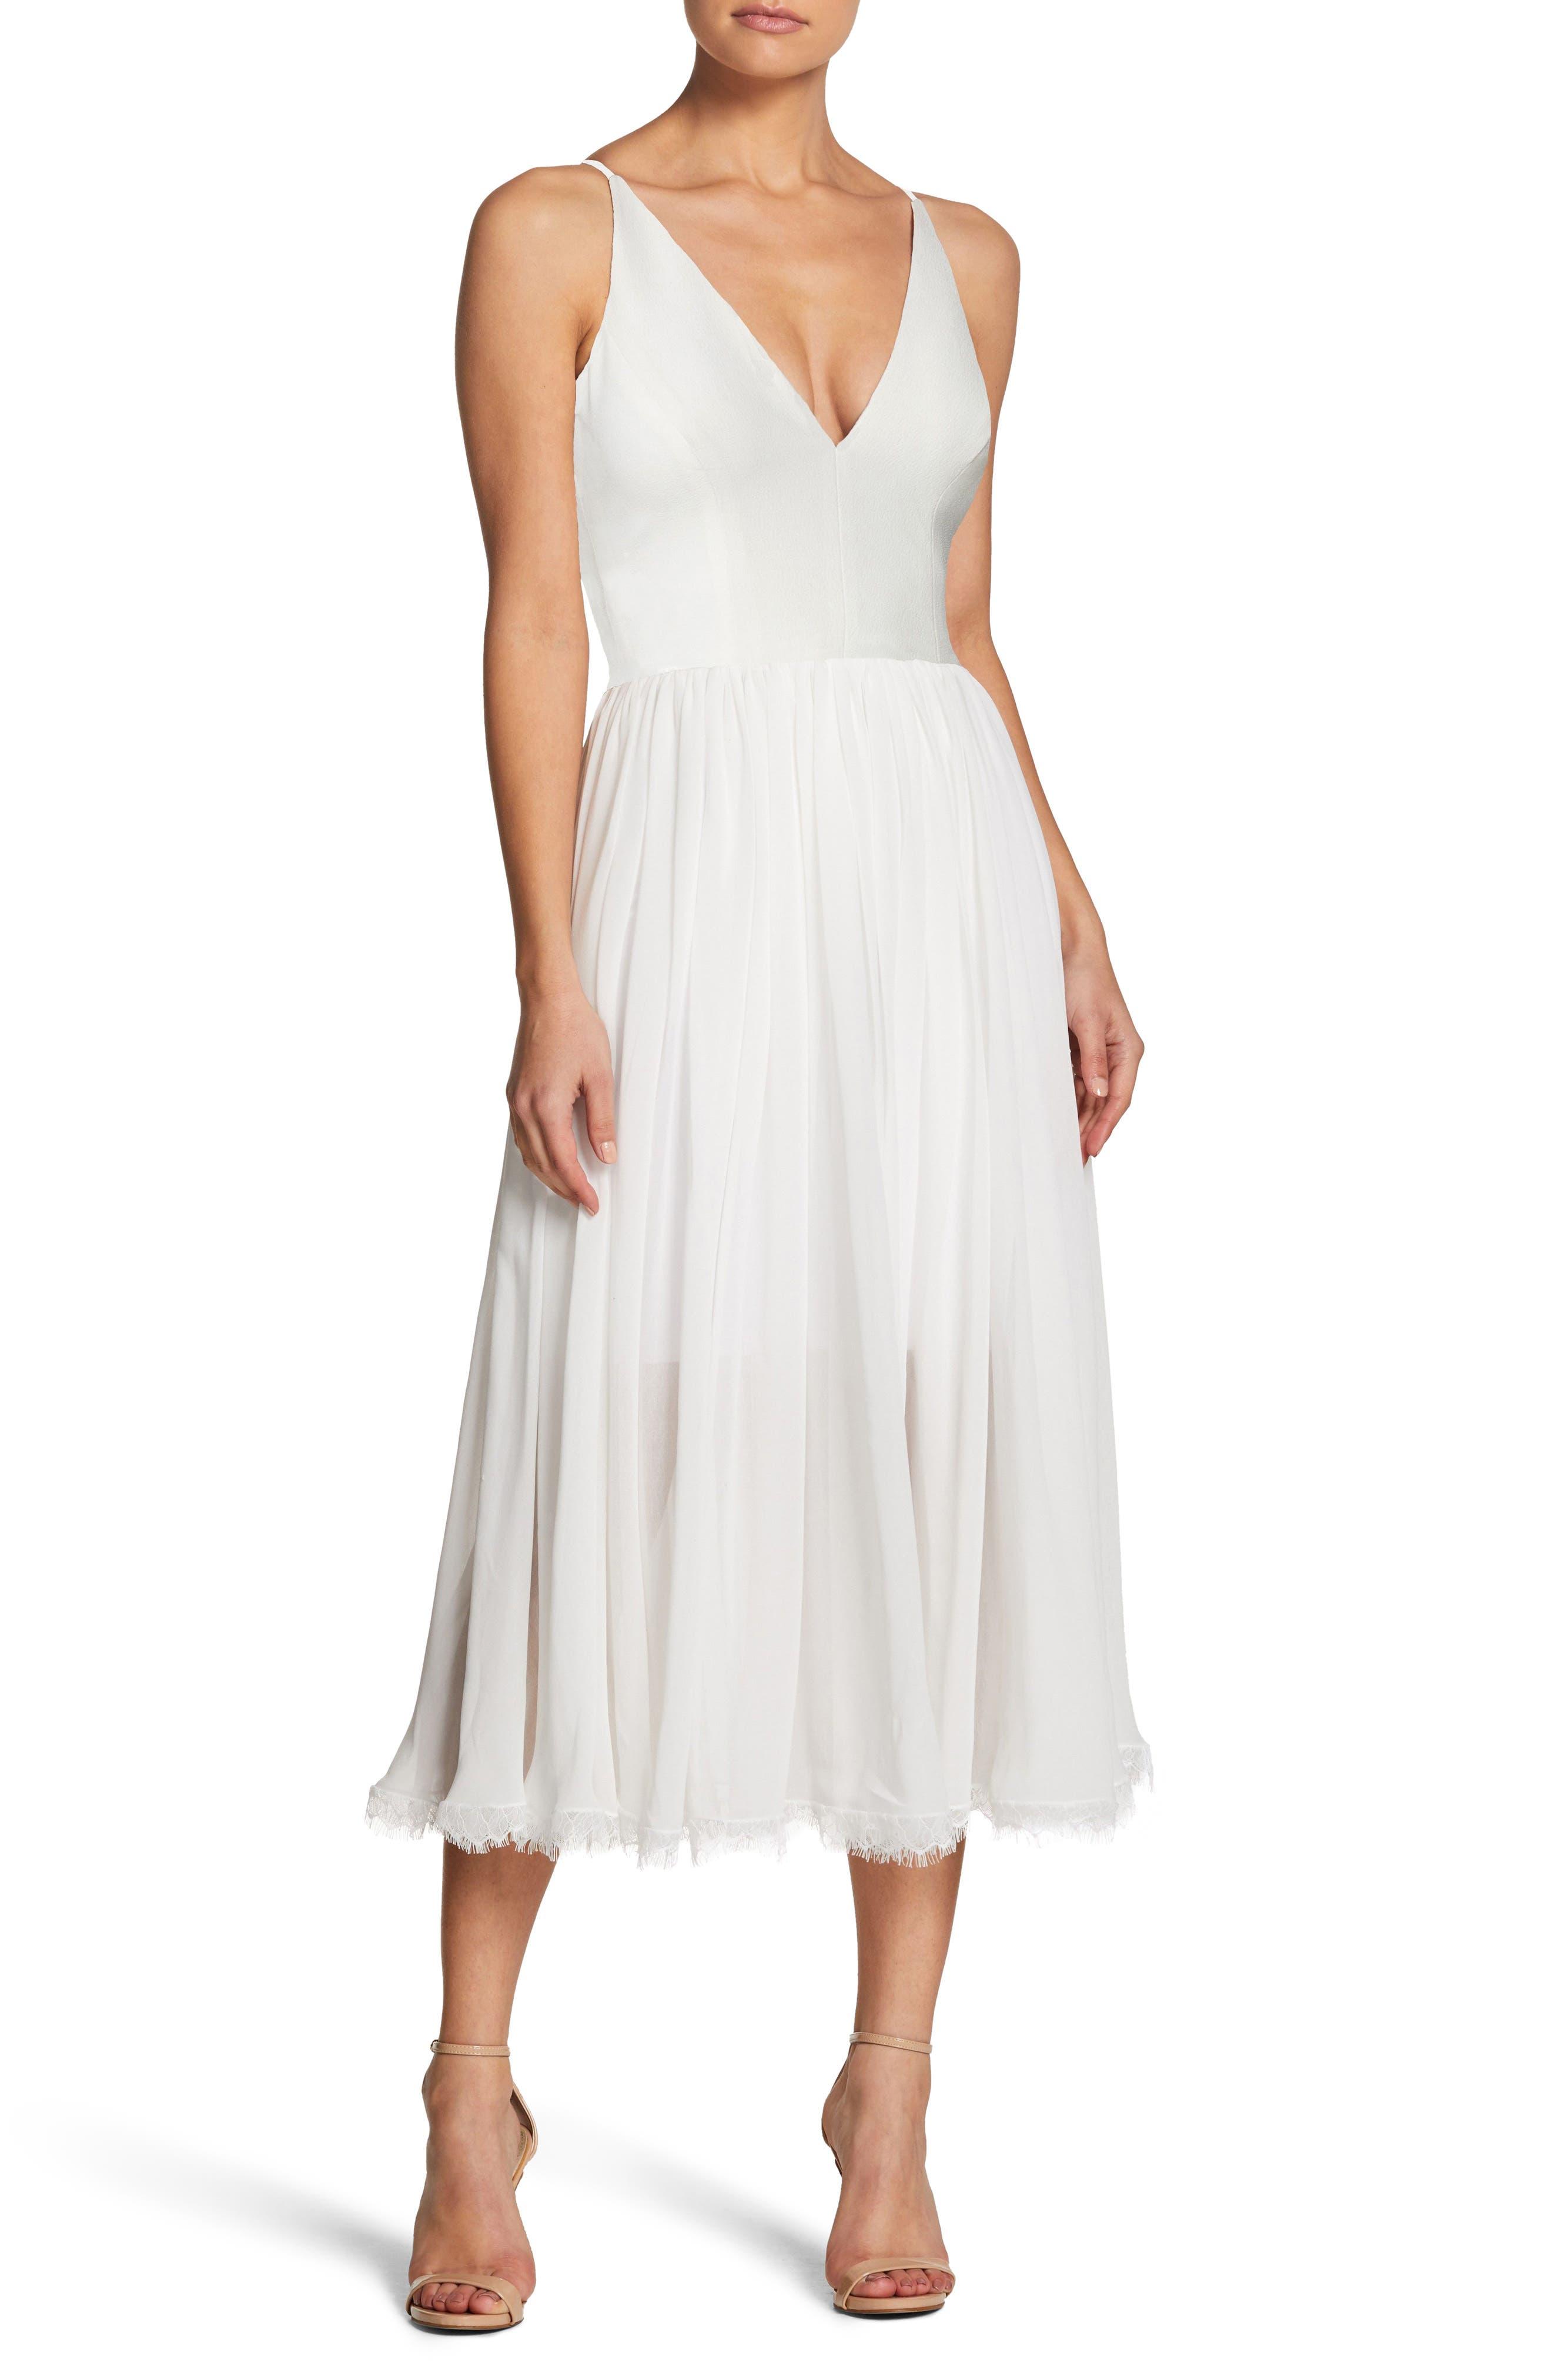 Alicia Mixed Media Midi Dress,                             Main thumbnail 1, color,                             OFF WHITE